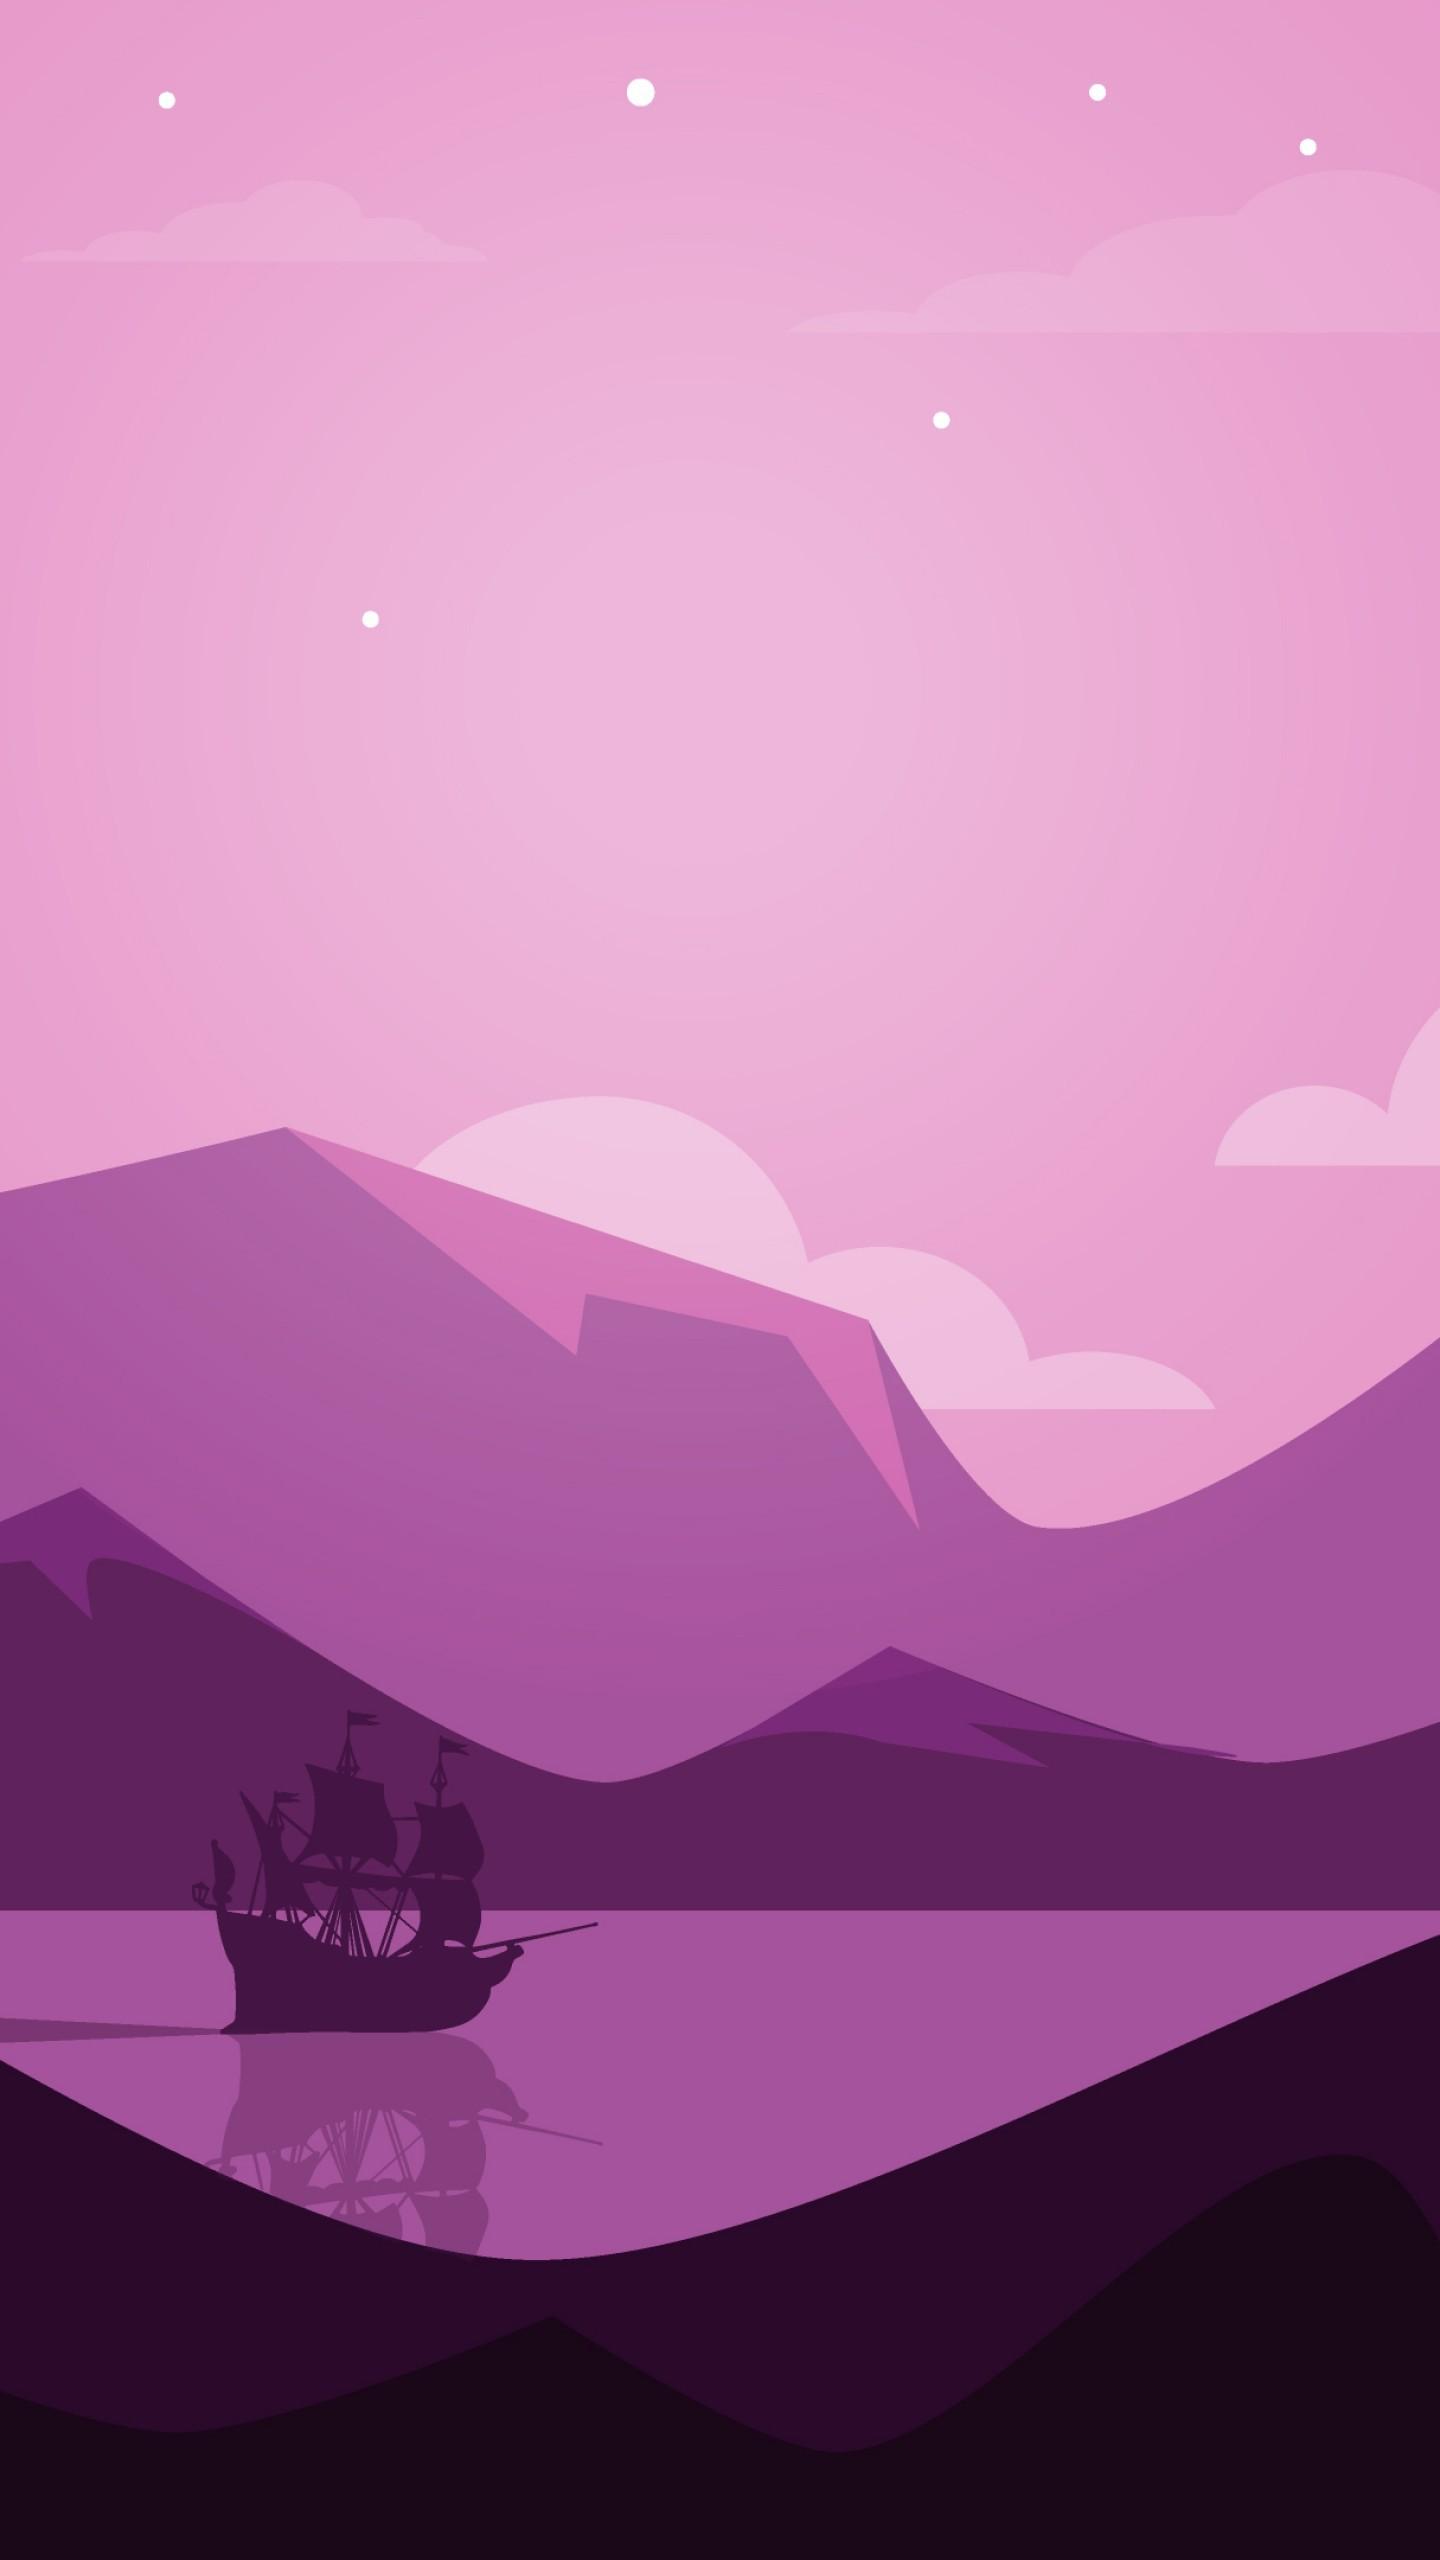 عکس زمینه چشم انداز کوه دریا با رنگ بنفش پس زمینه